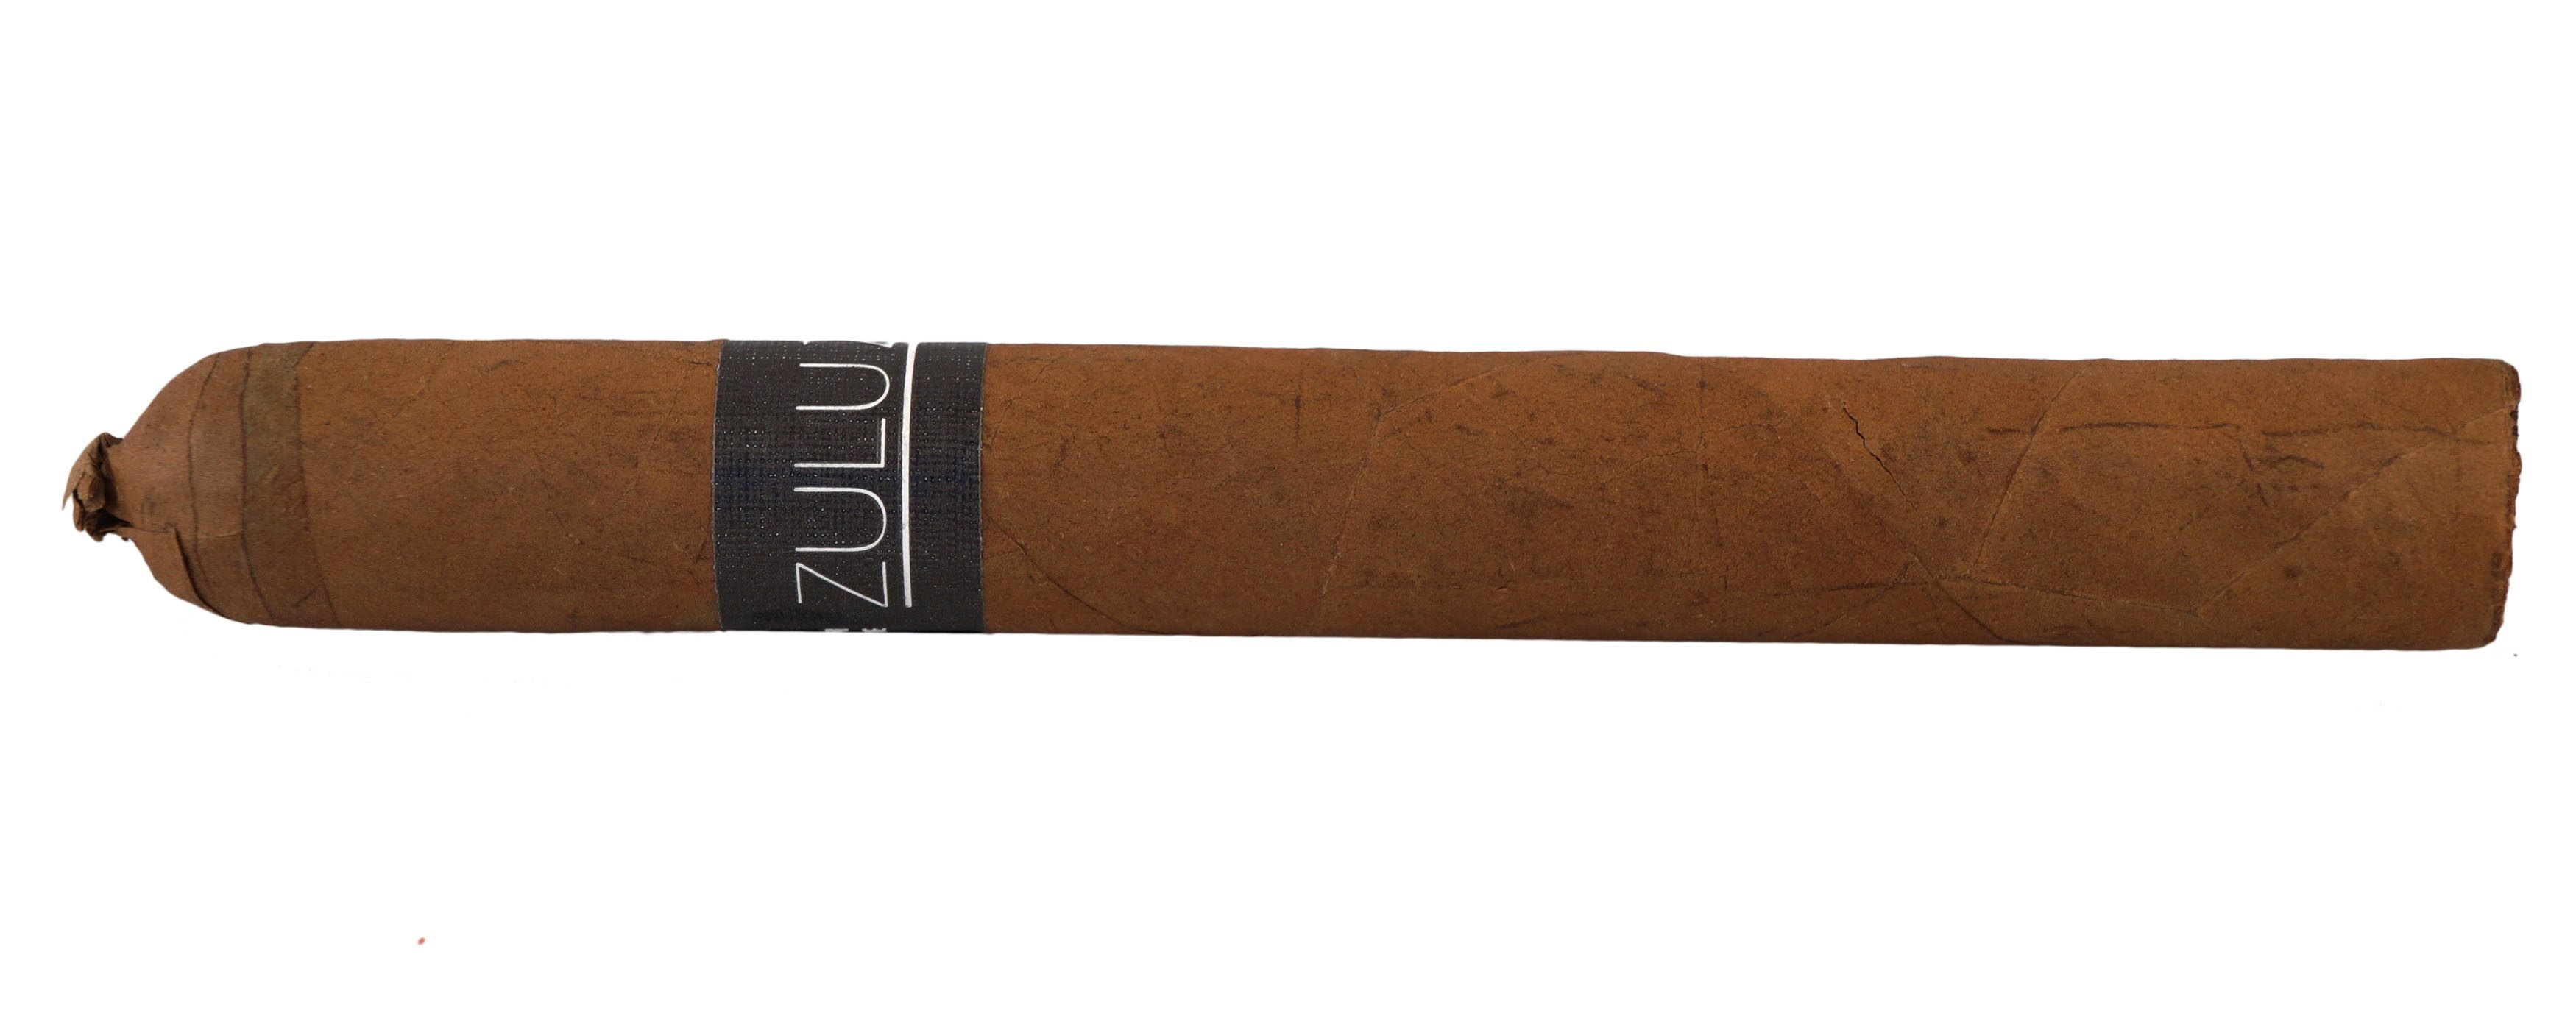 Blind Cigar Review: George Rico | S.T.K. Miami Zulu Zulu Mas Paz Edition Connecticut